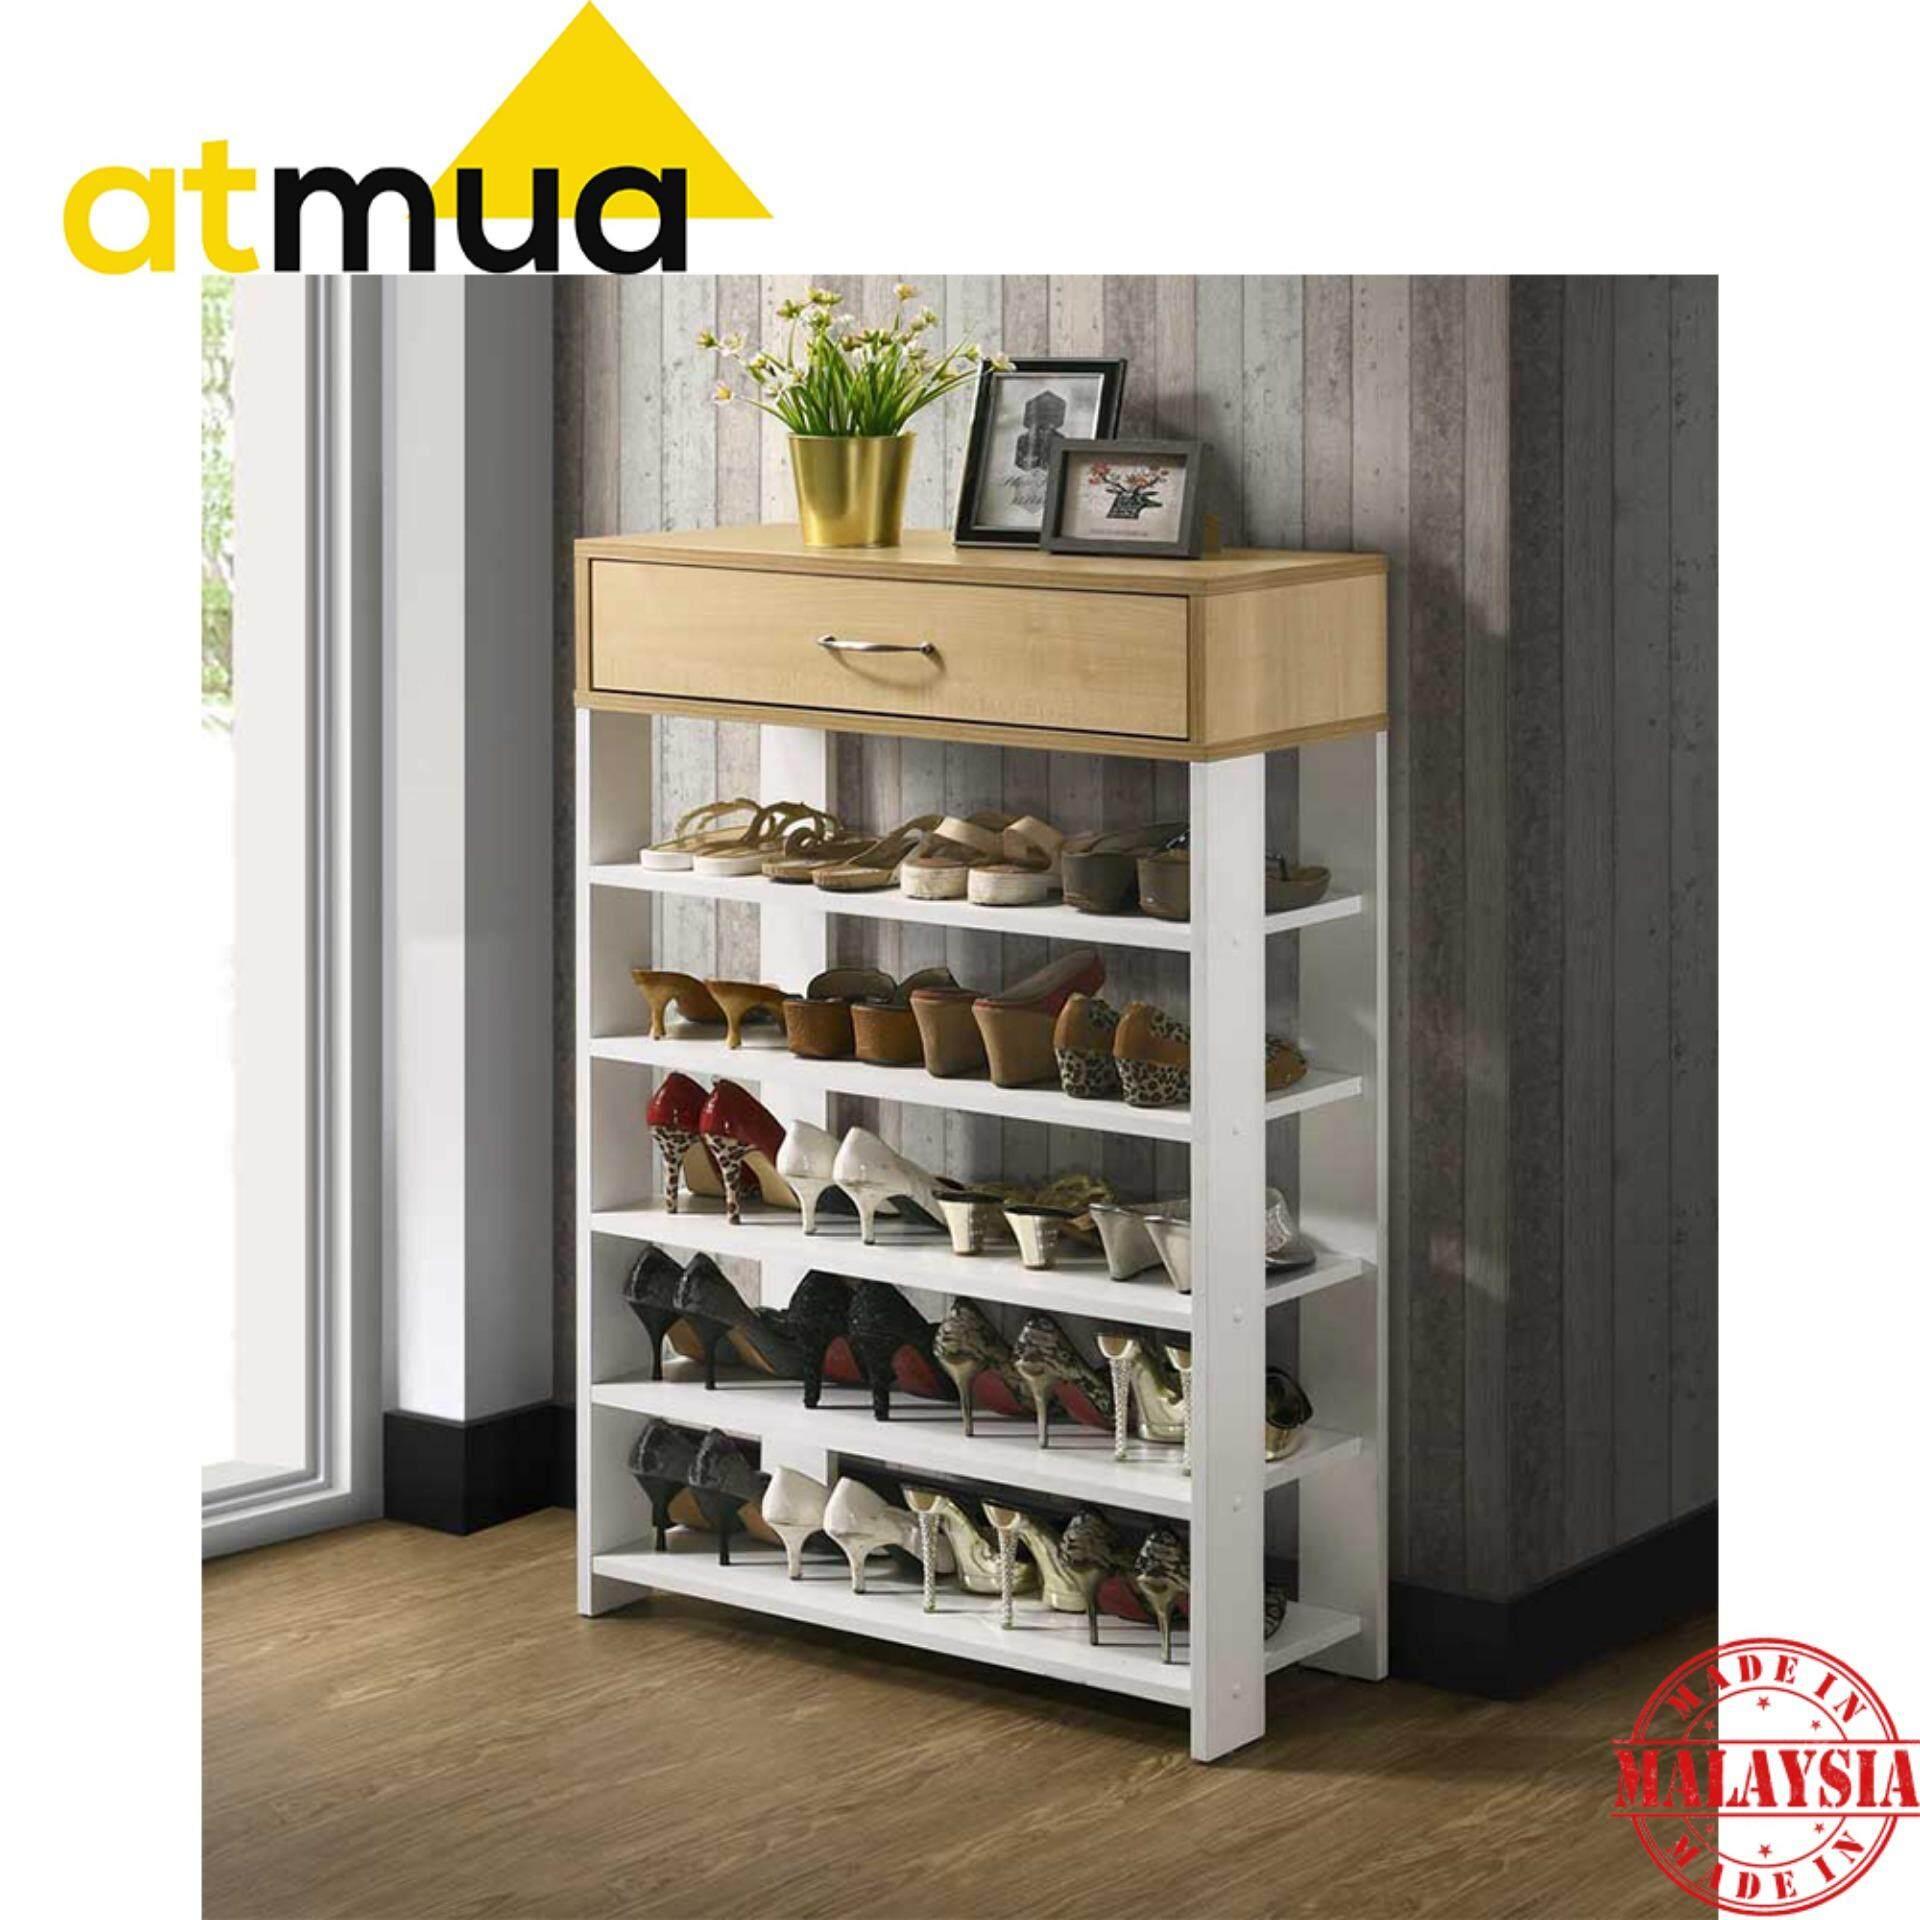 Atmua Hamton Indoor Shoe Rack 5 Rack with 1 Storage (Simple Design) [Full Melamine Board]